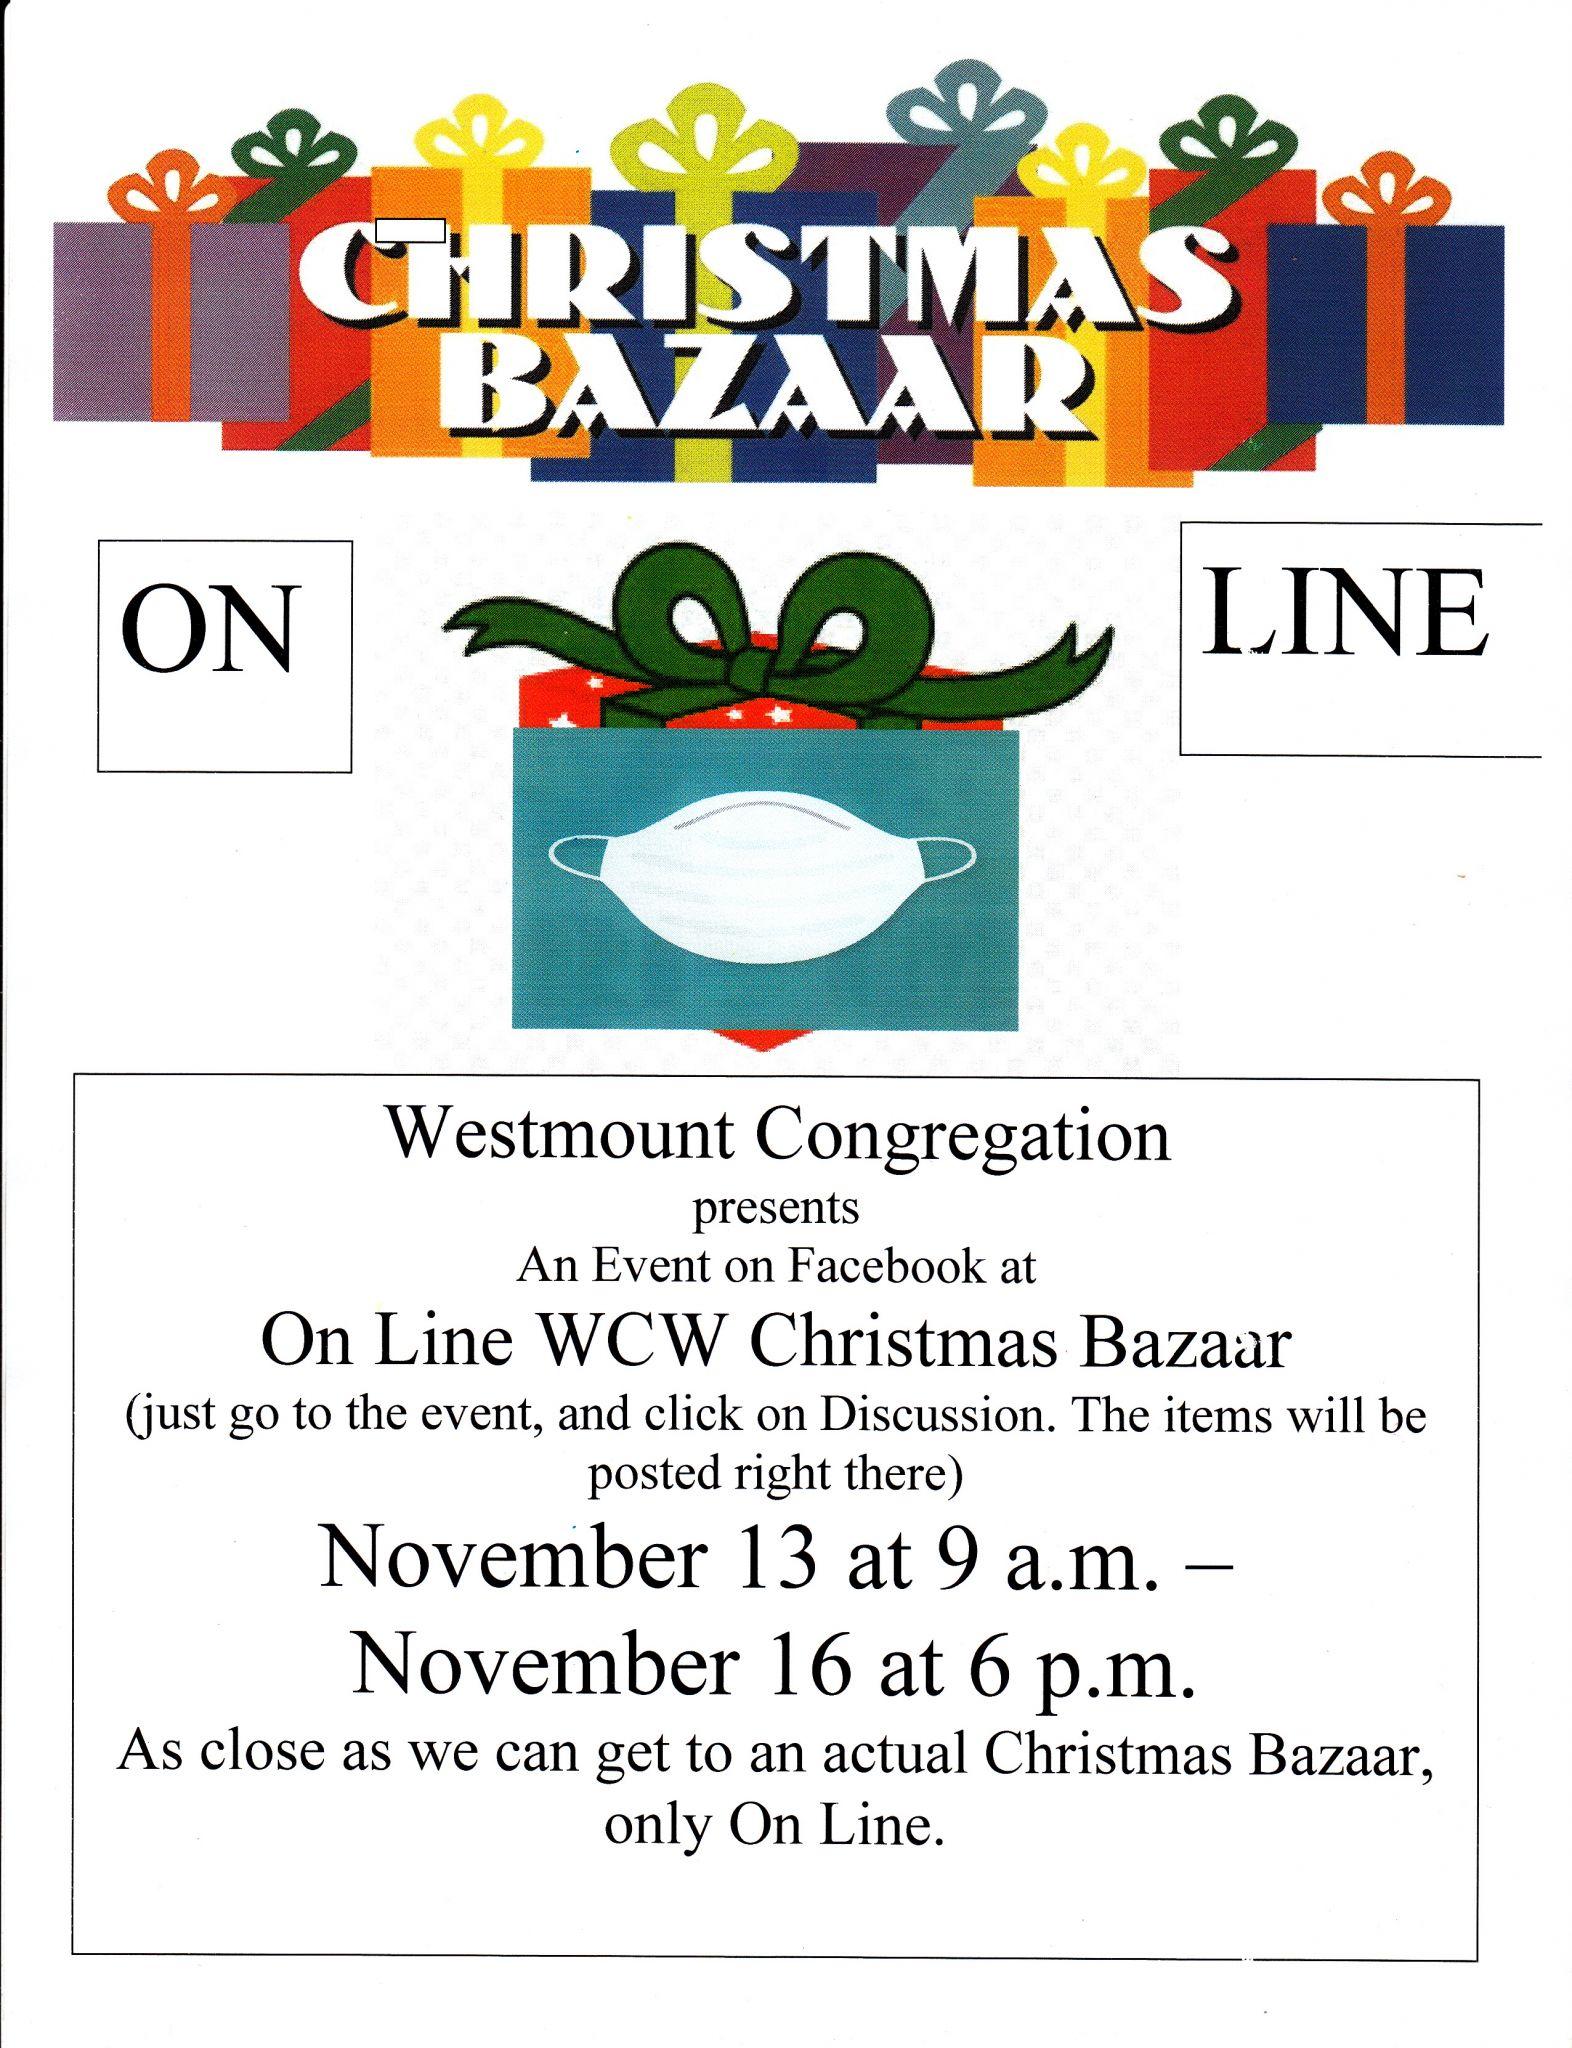 Poster for On Line Christmas Bazaar - On Line WCW Christmas Bazaar